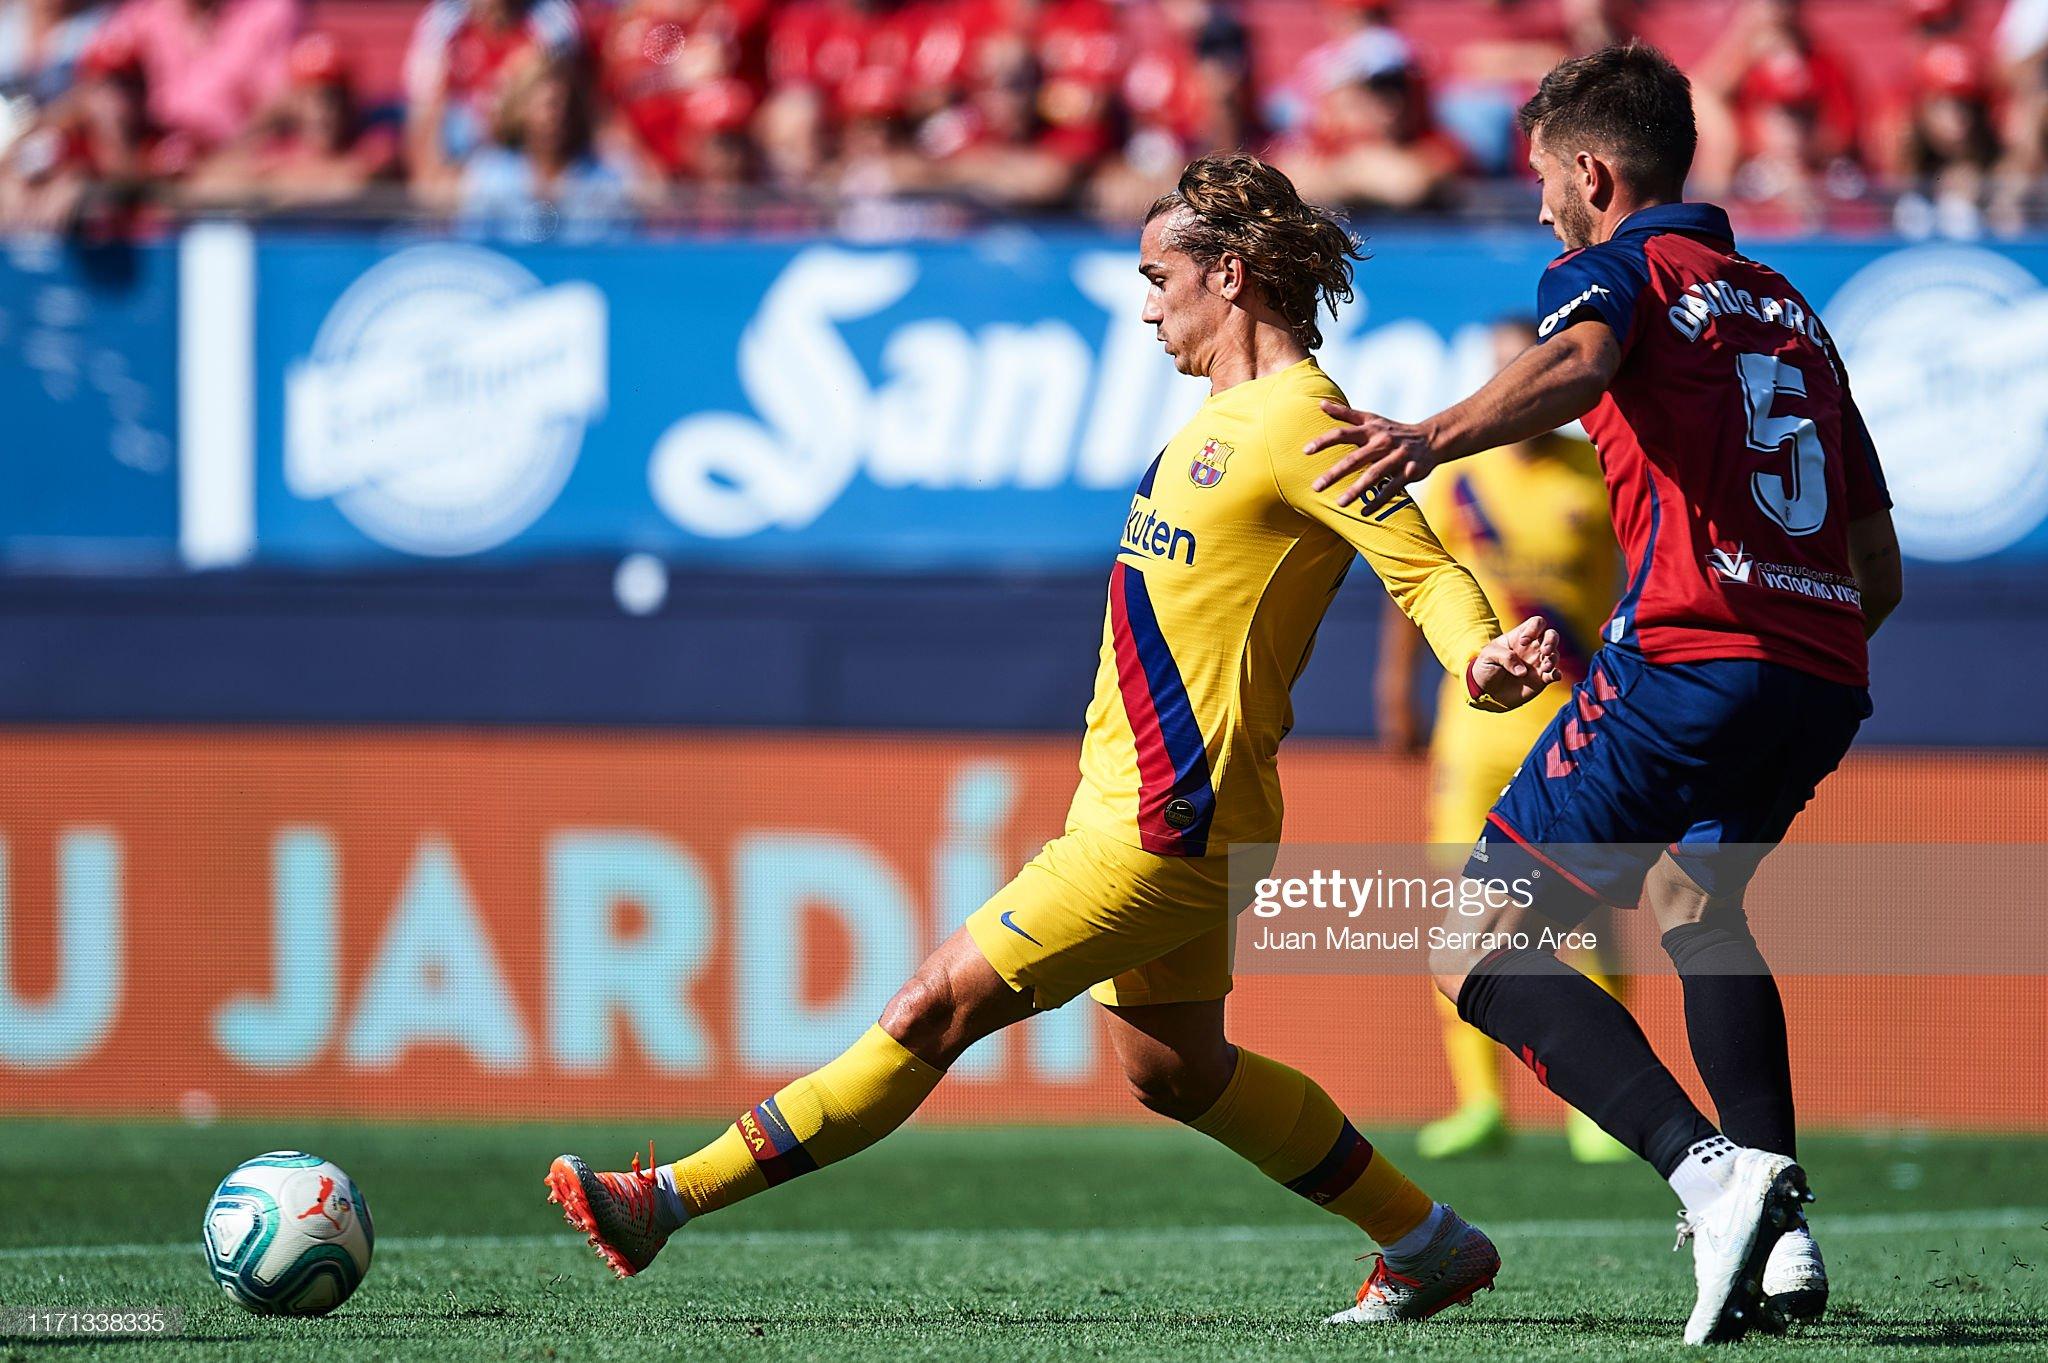 صور مباراة : أوساسونا - برشلونة 2-2 ( 31-08-2019 )  Antoine-griezmann-of-fc-barcelona-being-followed-by-david-garcia-of-picture-id1171338335?s=2048x2048